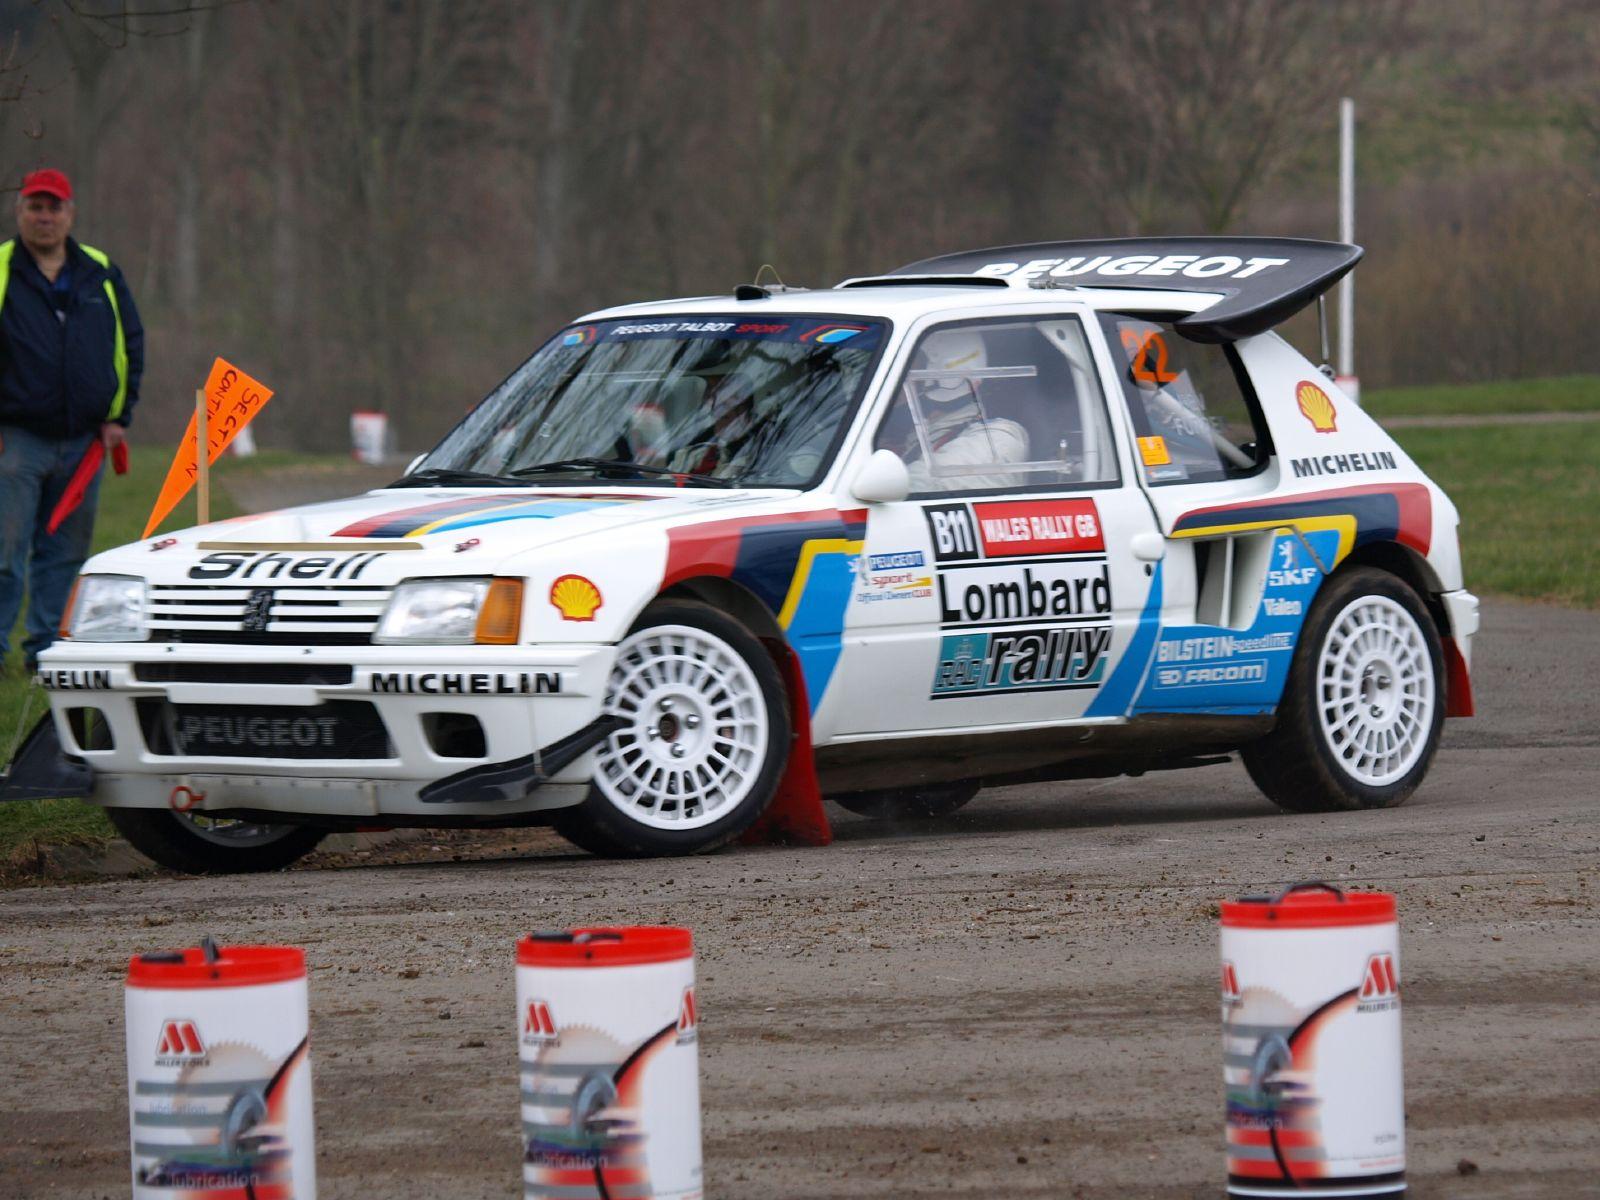 datei:peugeot 205 turbo 16 - race retro 2008 02 – wikipedia